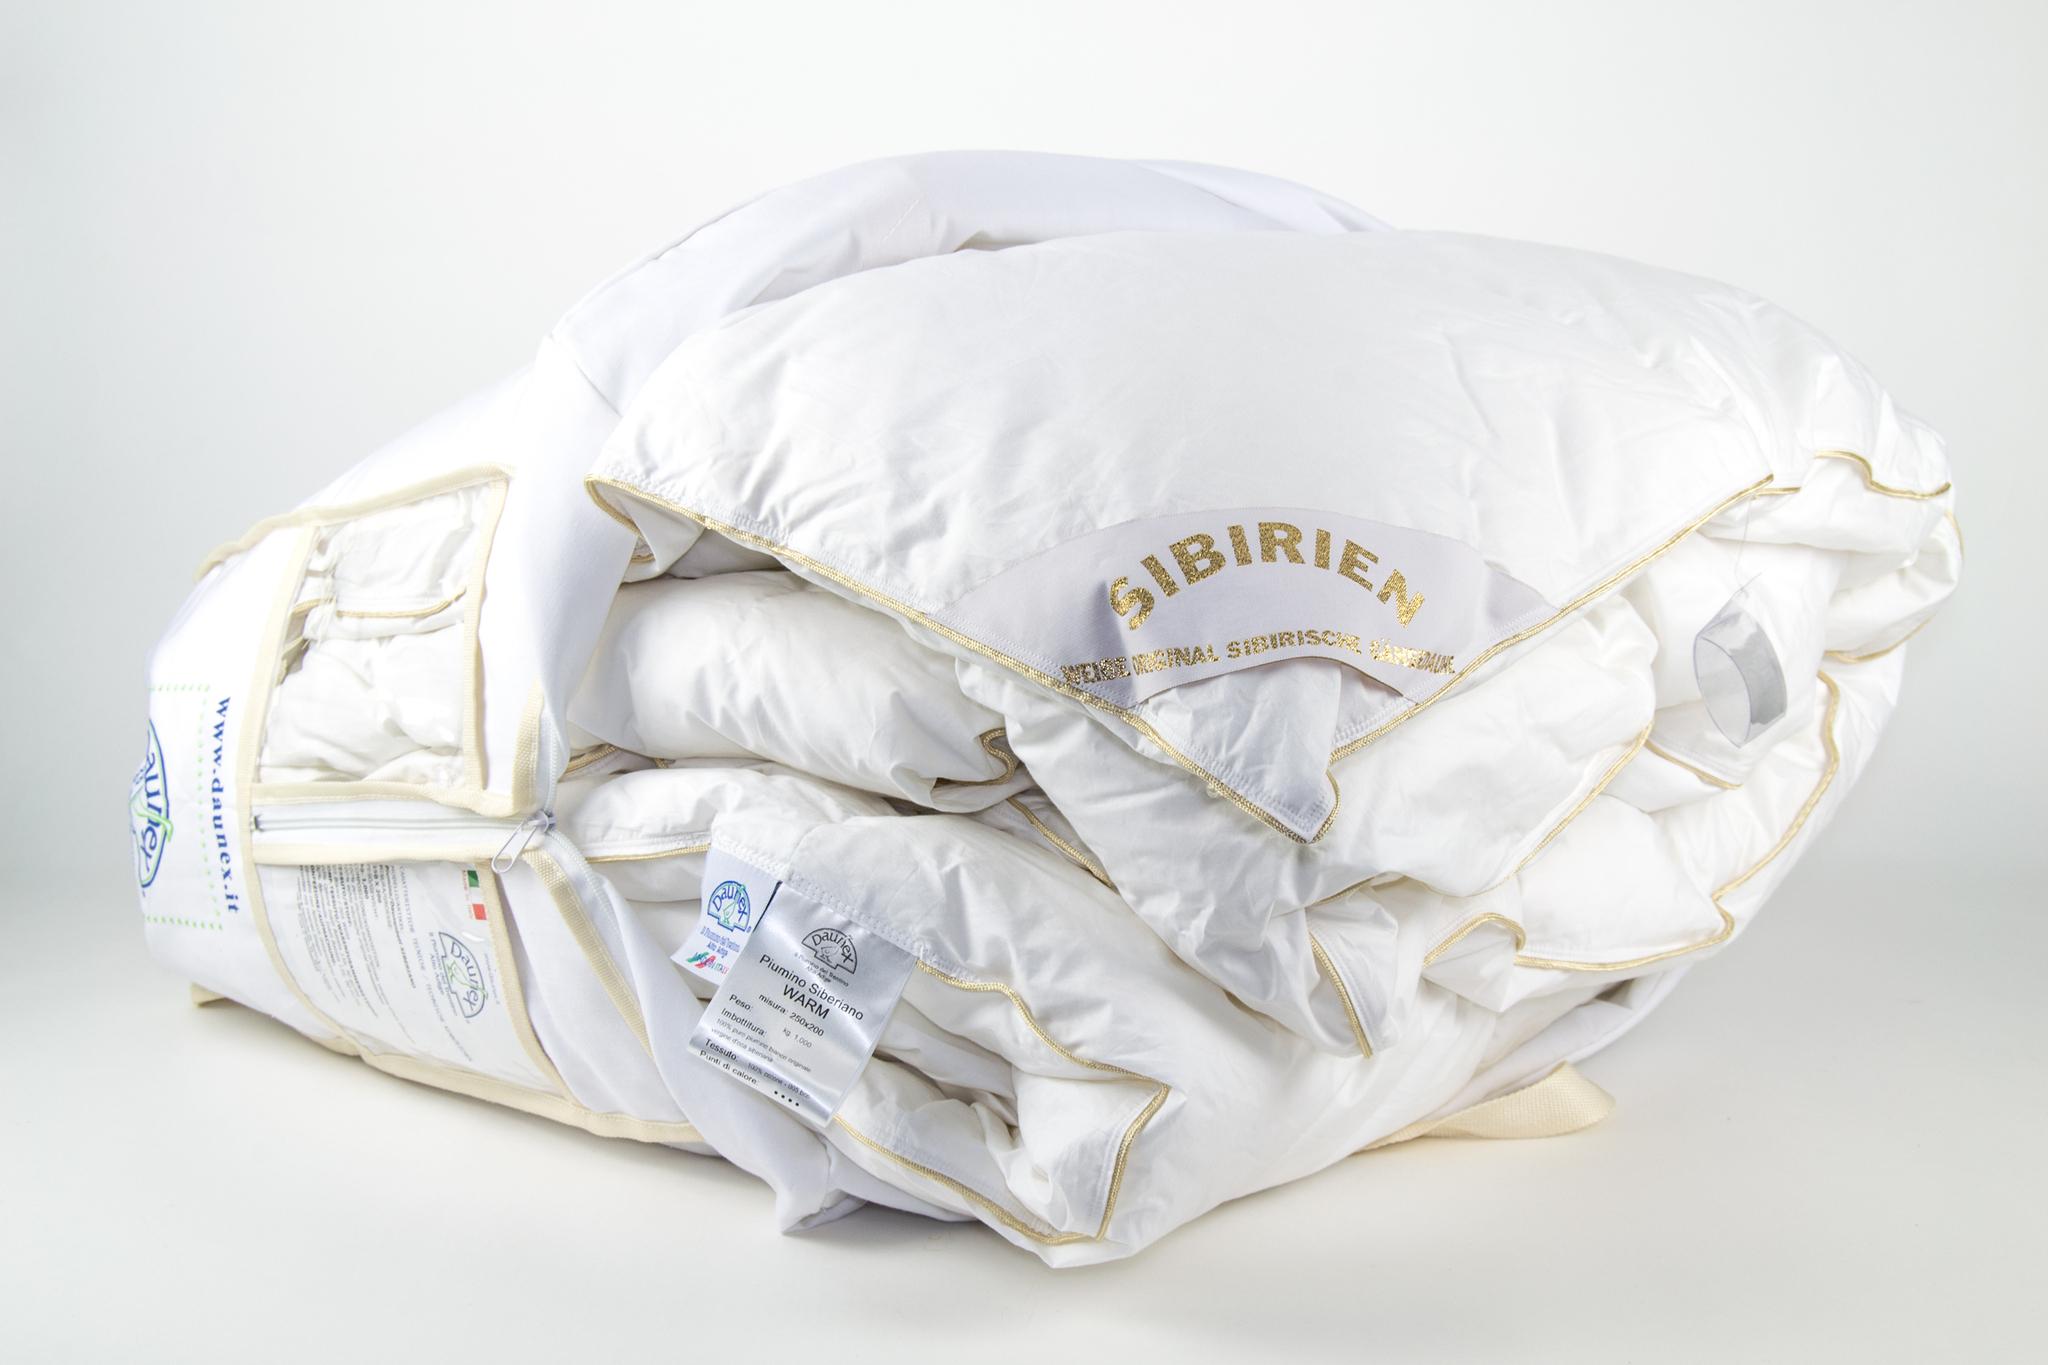 Одеяла Элитное одеяло пуховое 220х240 Siberiano от Daunex elitnoe-odeyalo-puhovoe-220h240-siberiano-ot-daunex-italiya.jpg